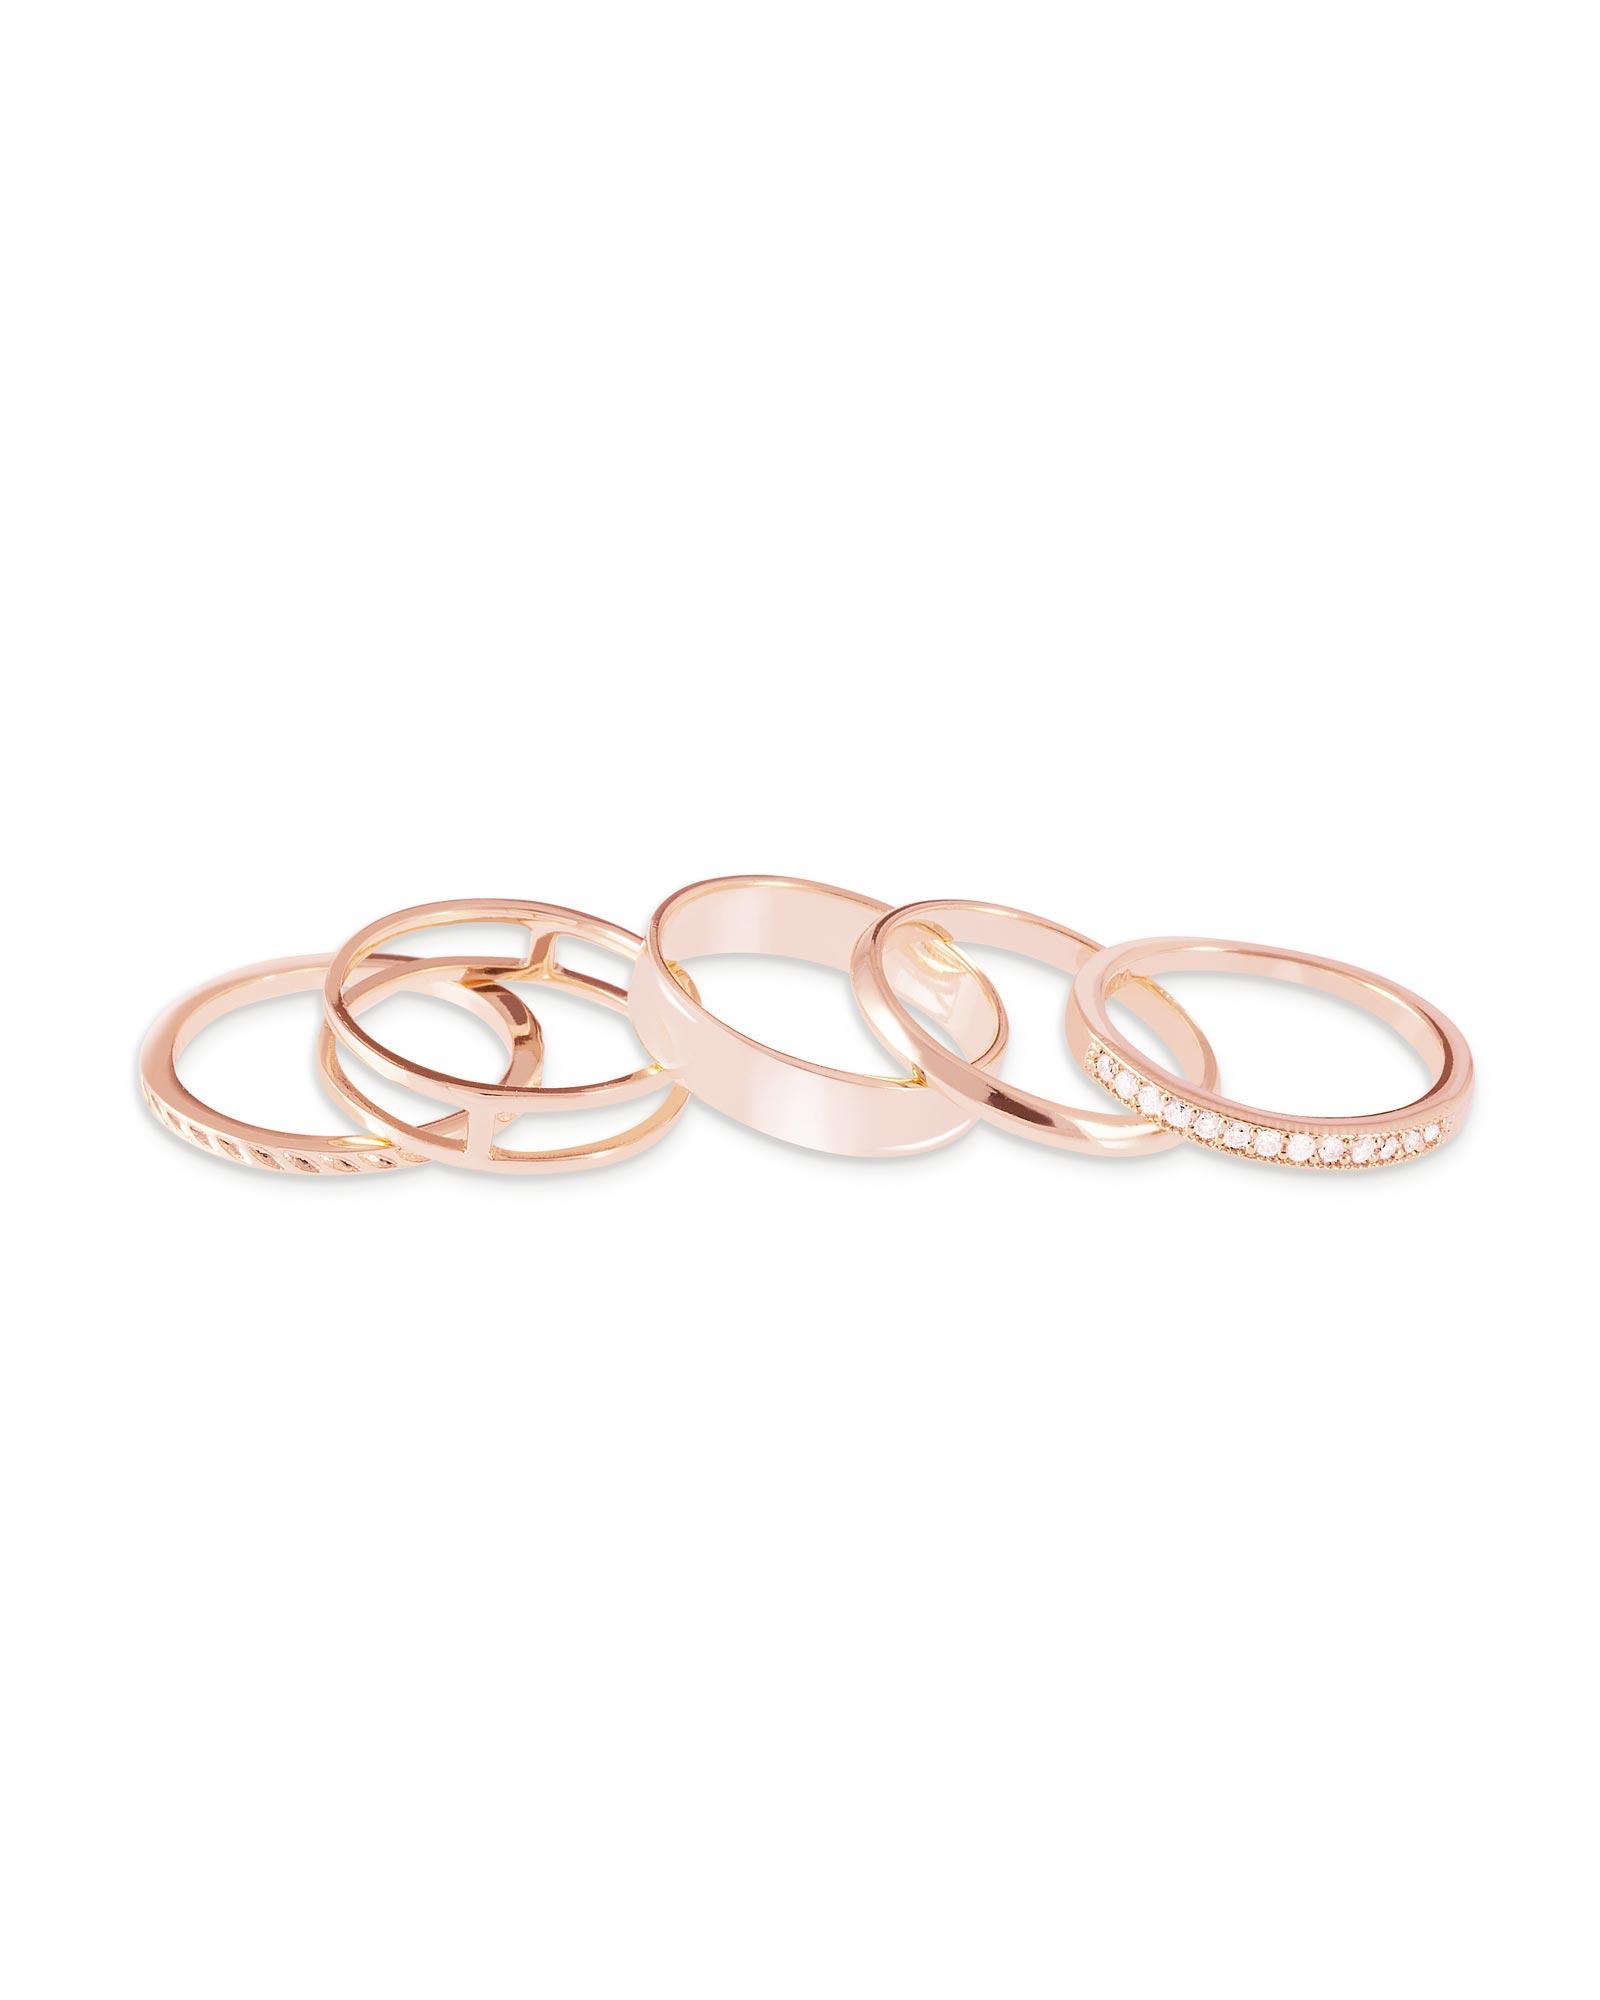 Kara Trendy Midi Ring Set in Rose Gold Kendra Scott